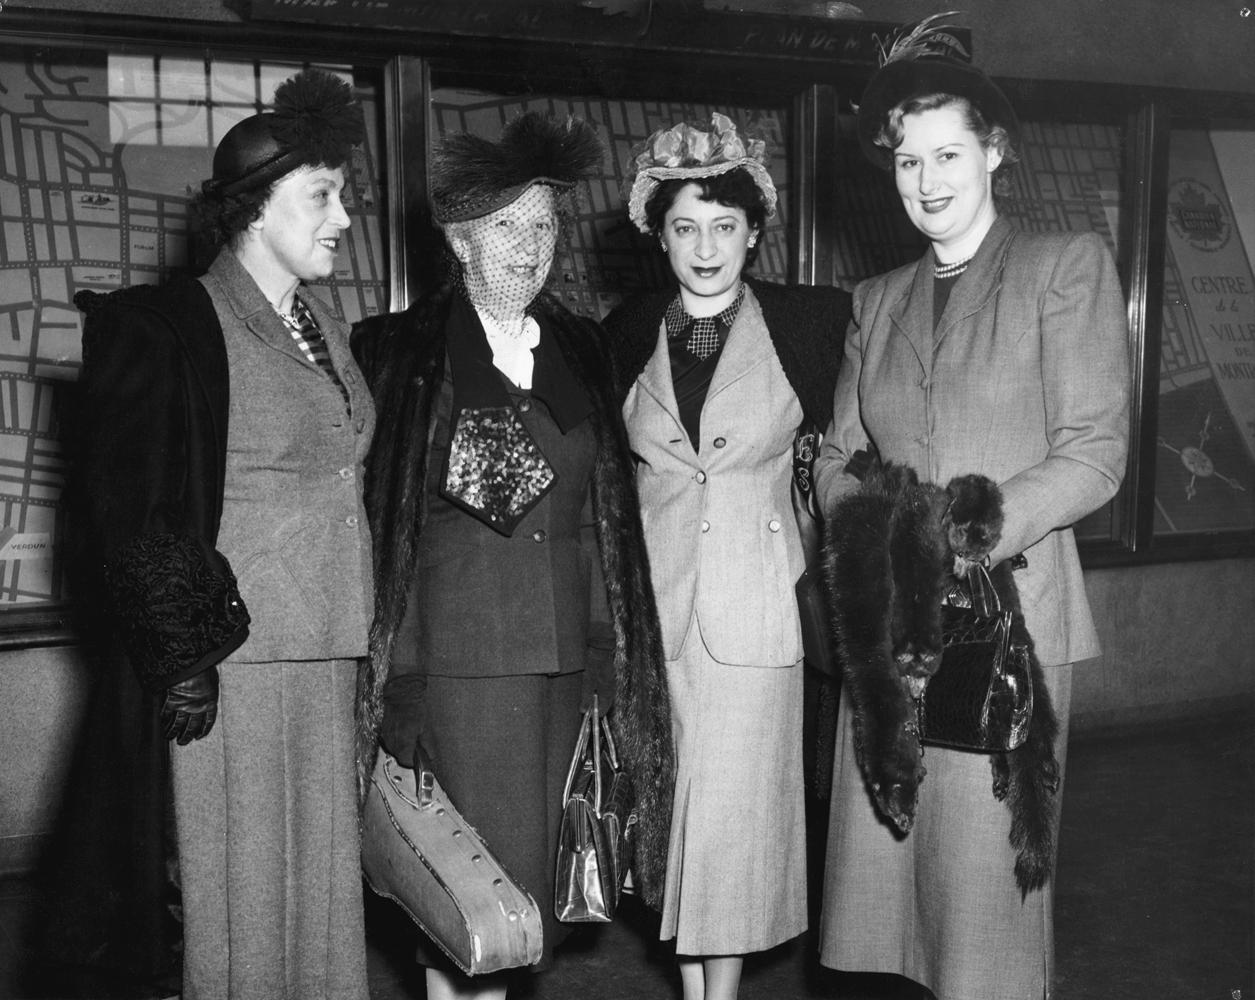 Madge Bowen, Lea Luboshutz, Ethel Stark, and MWSO Violinist Mrs. John Pratt